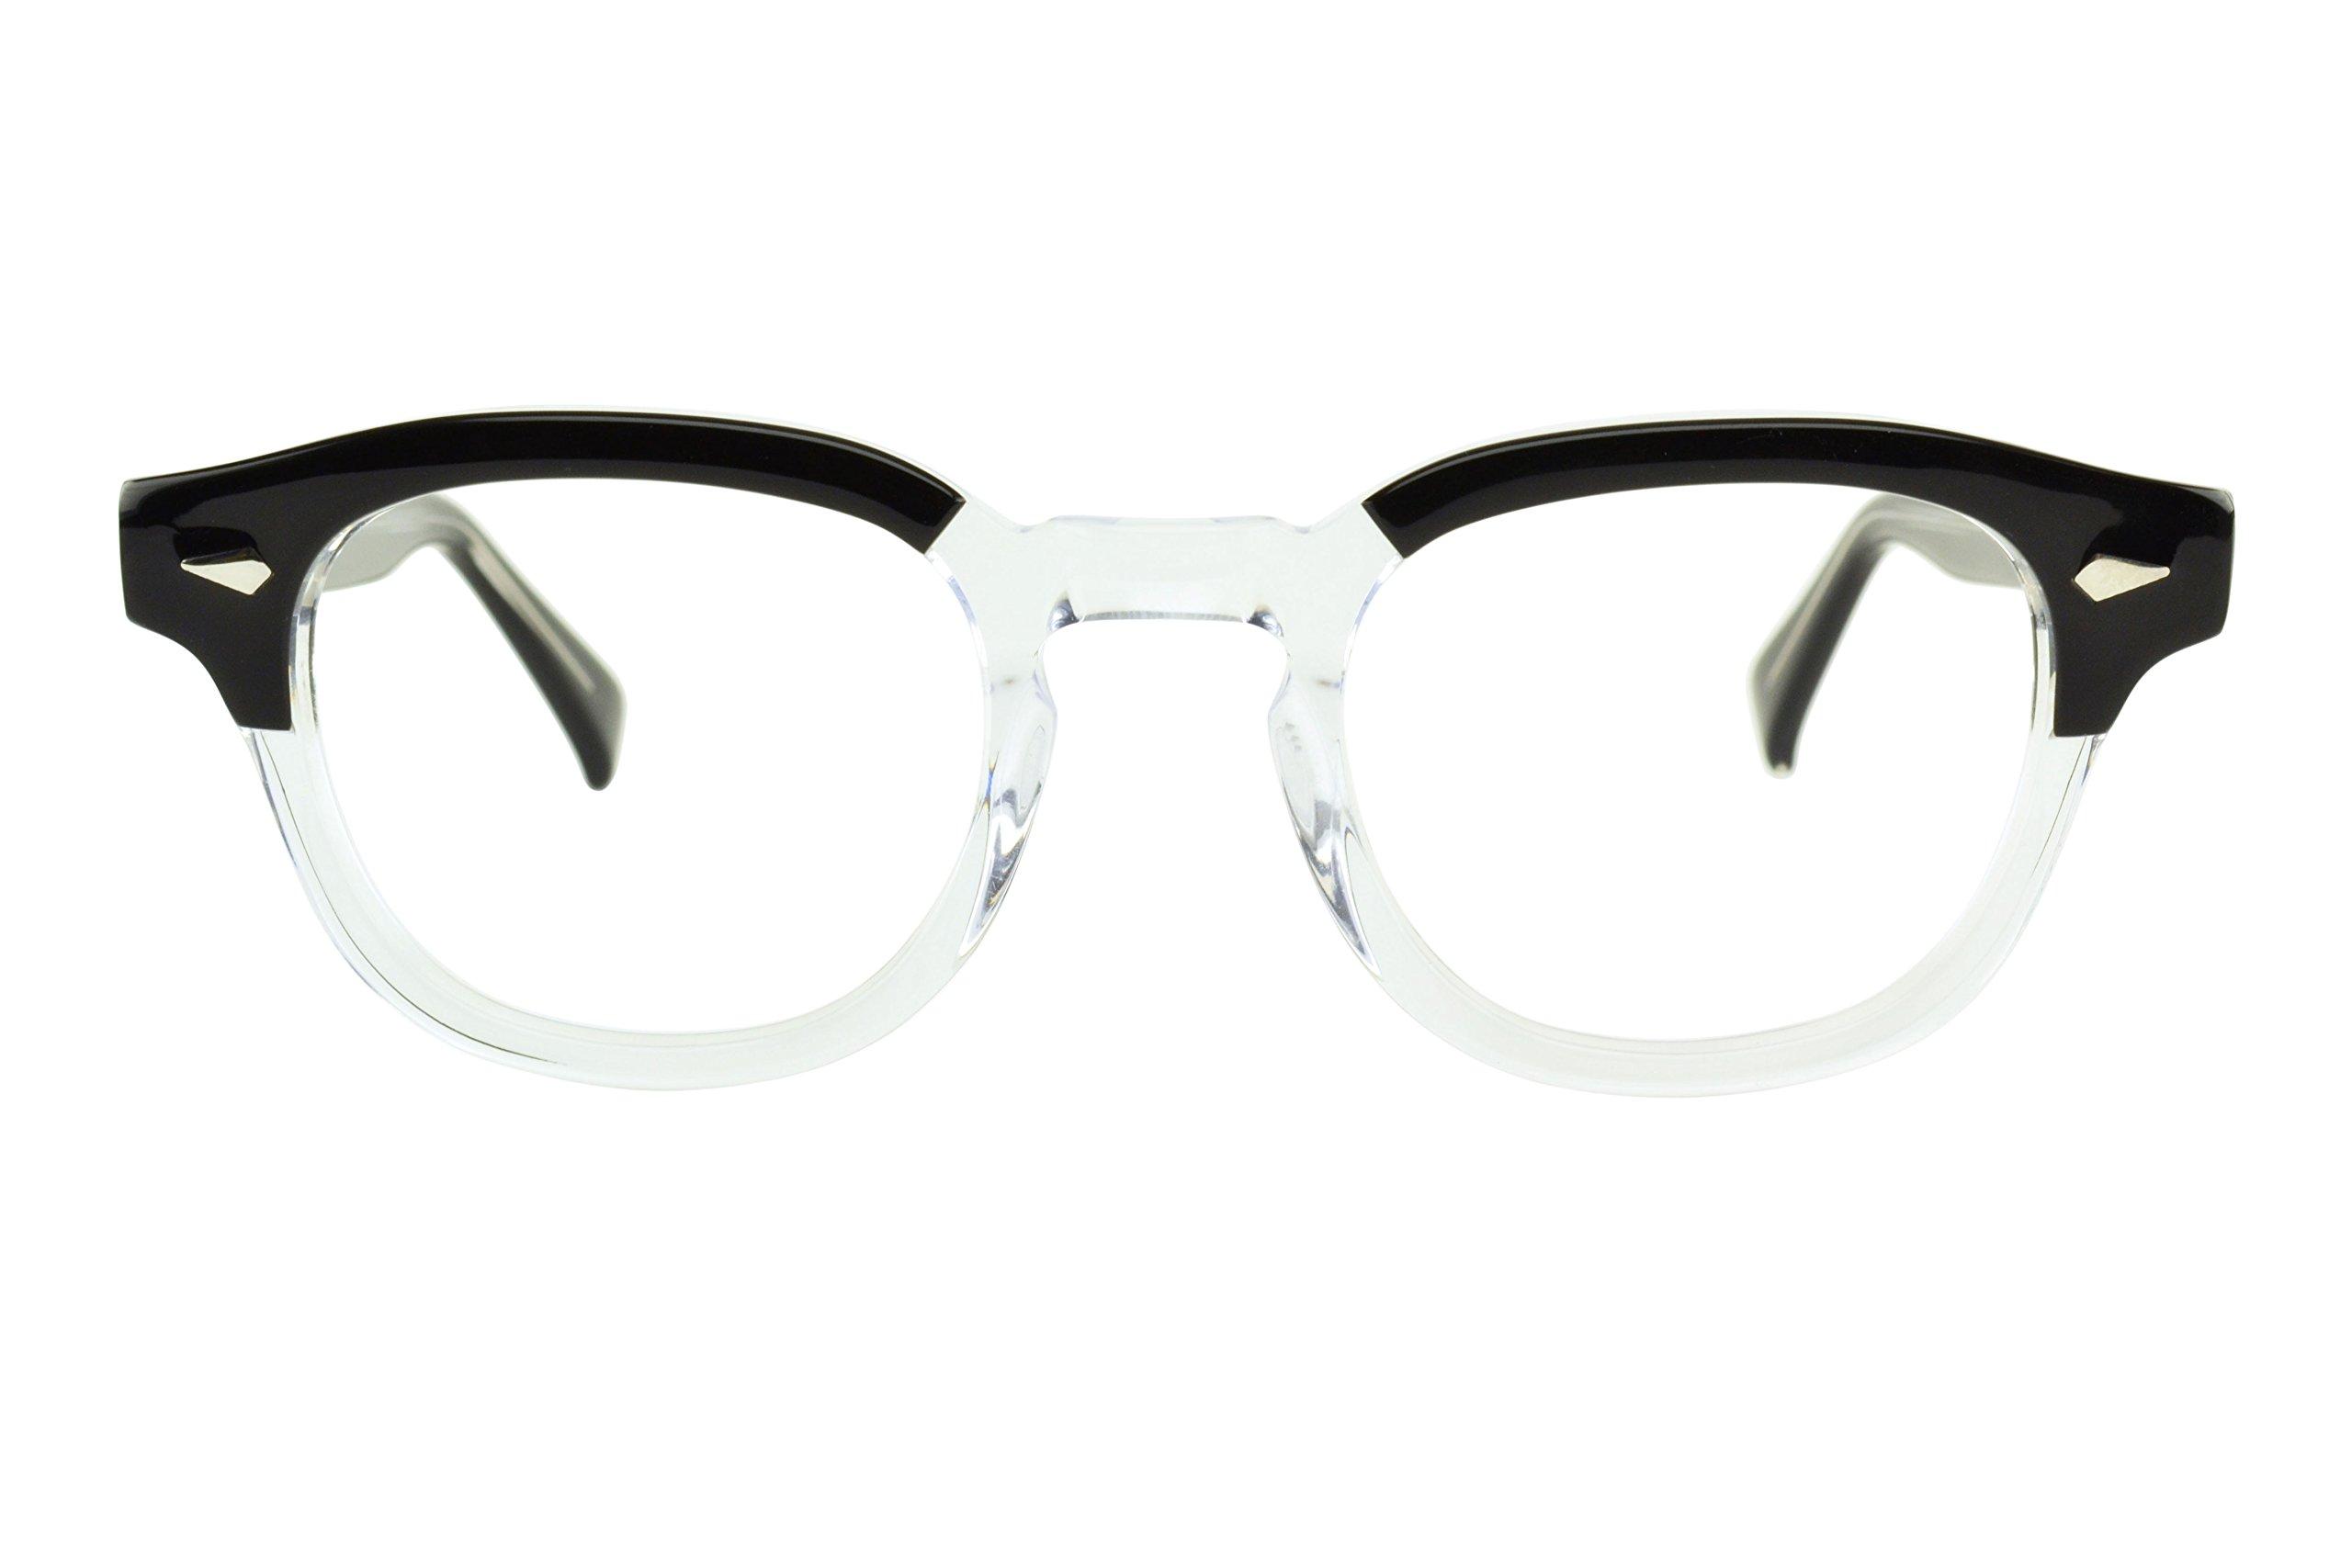 Blue Light Glasses Computer Reading, Gaming Blue Light Blocking Glasses Hand-Made Acetate Anti Eye Strain Eyewear for Men and Women (Rim Size VLV46)